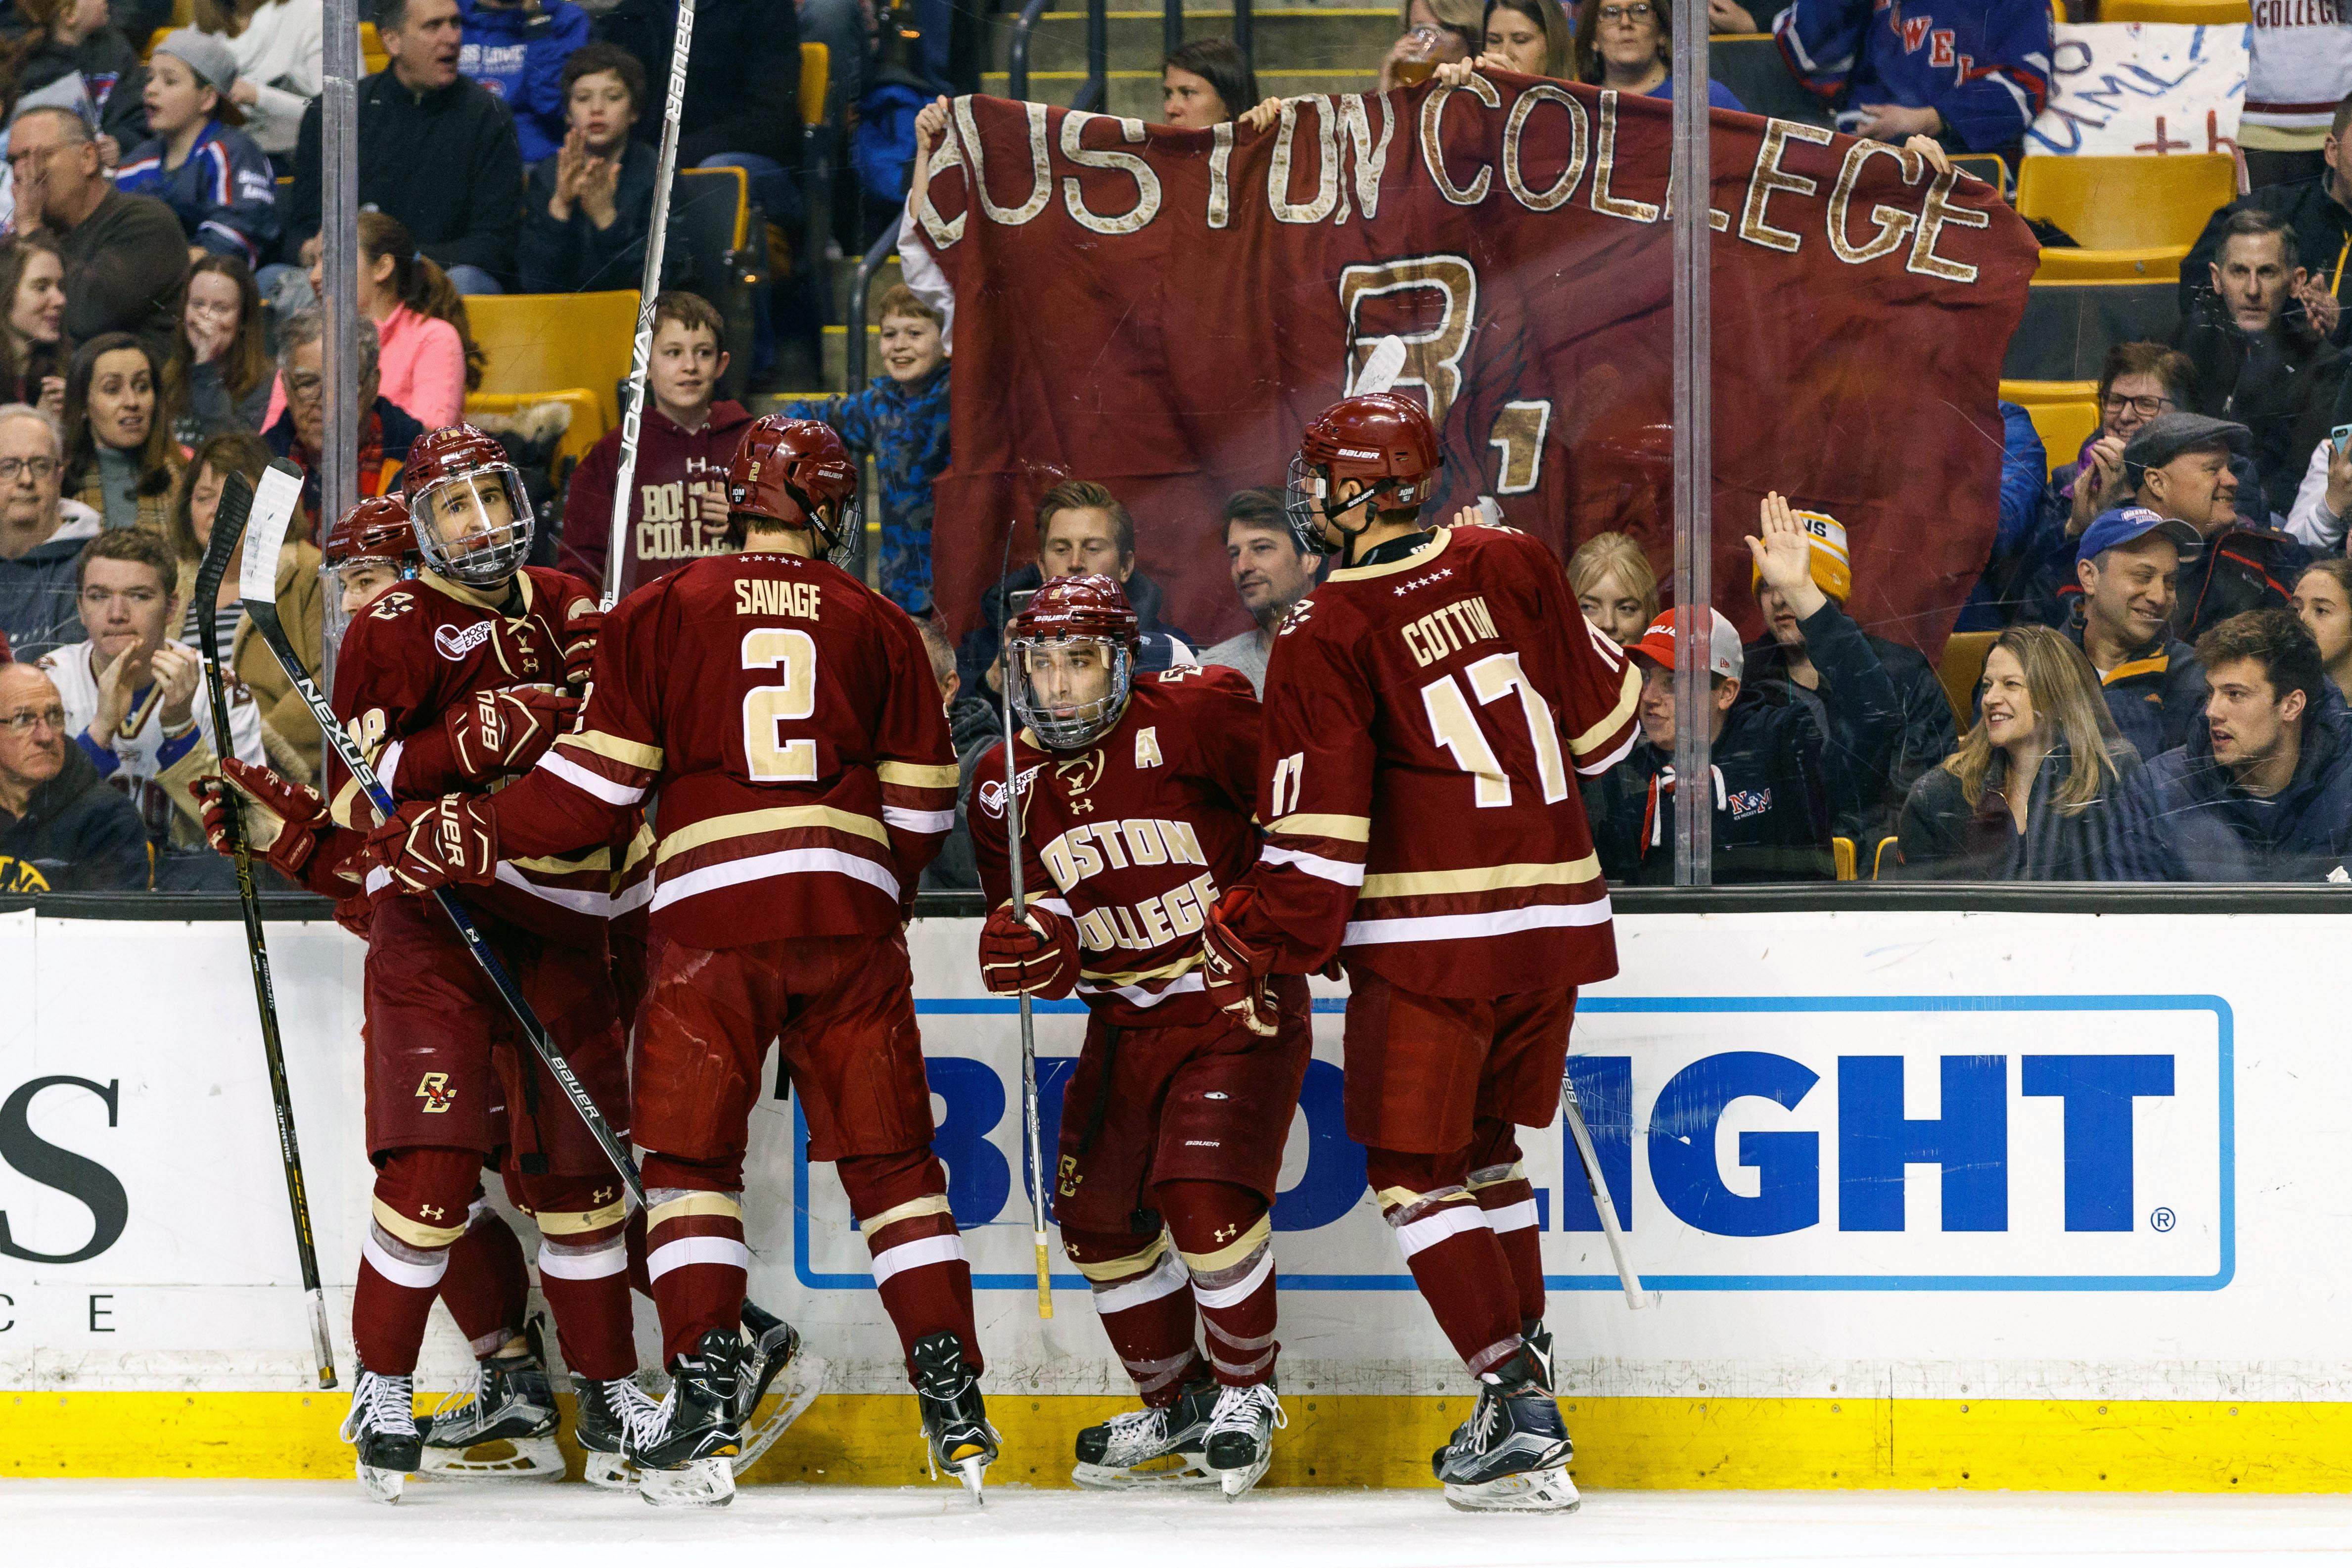 COLLEGE HOCKEY: MAR 18 Hockey East Championship - UMass Lowell v Boston College